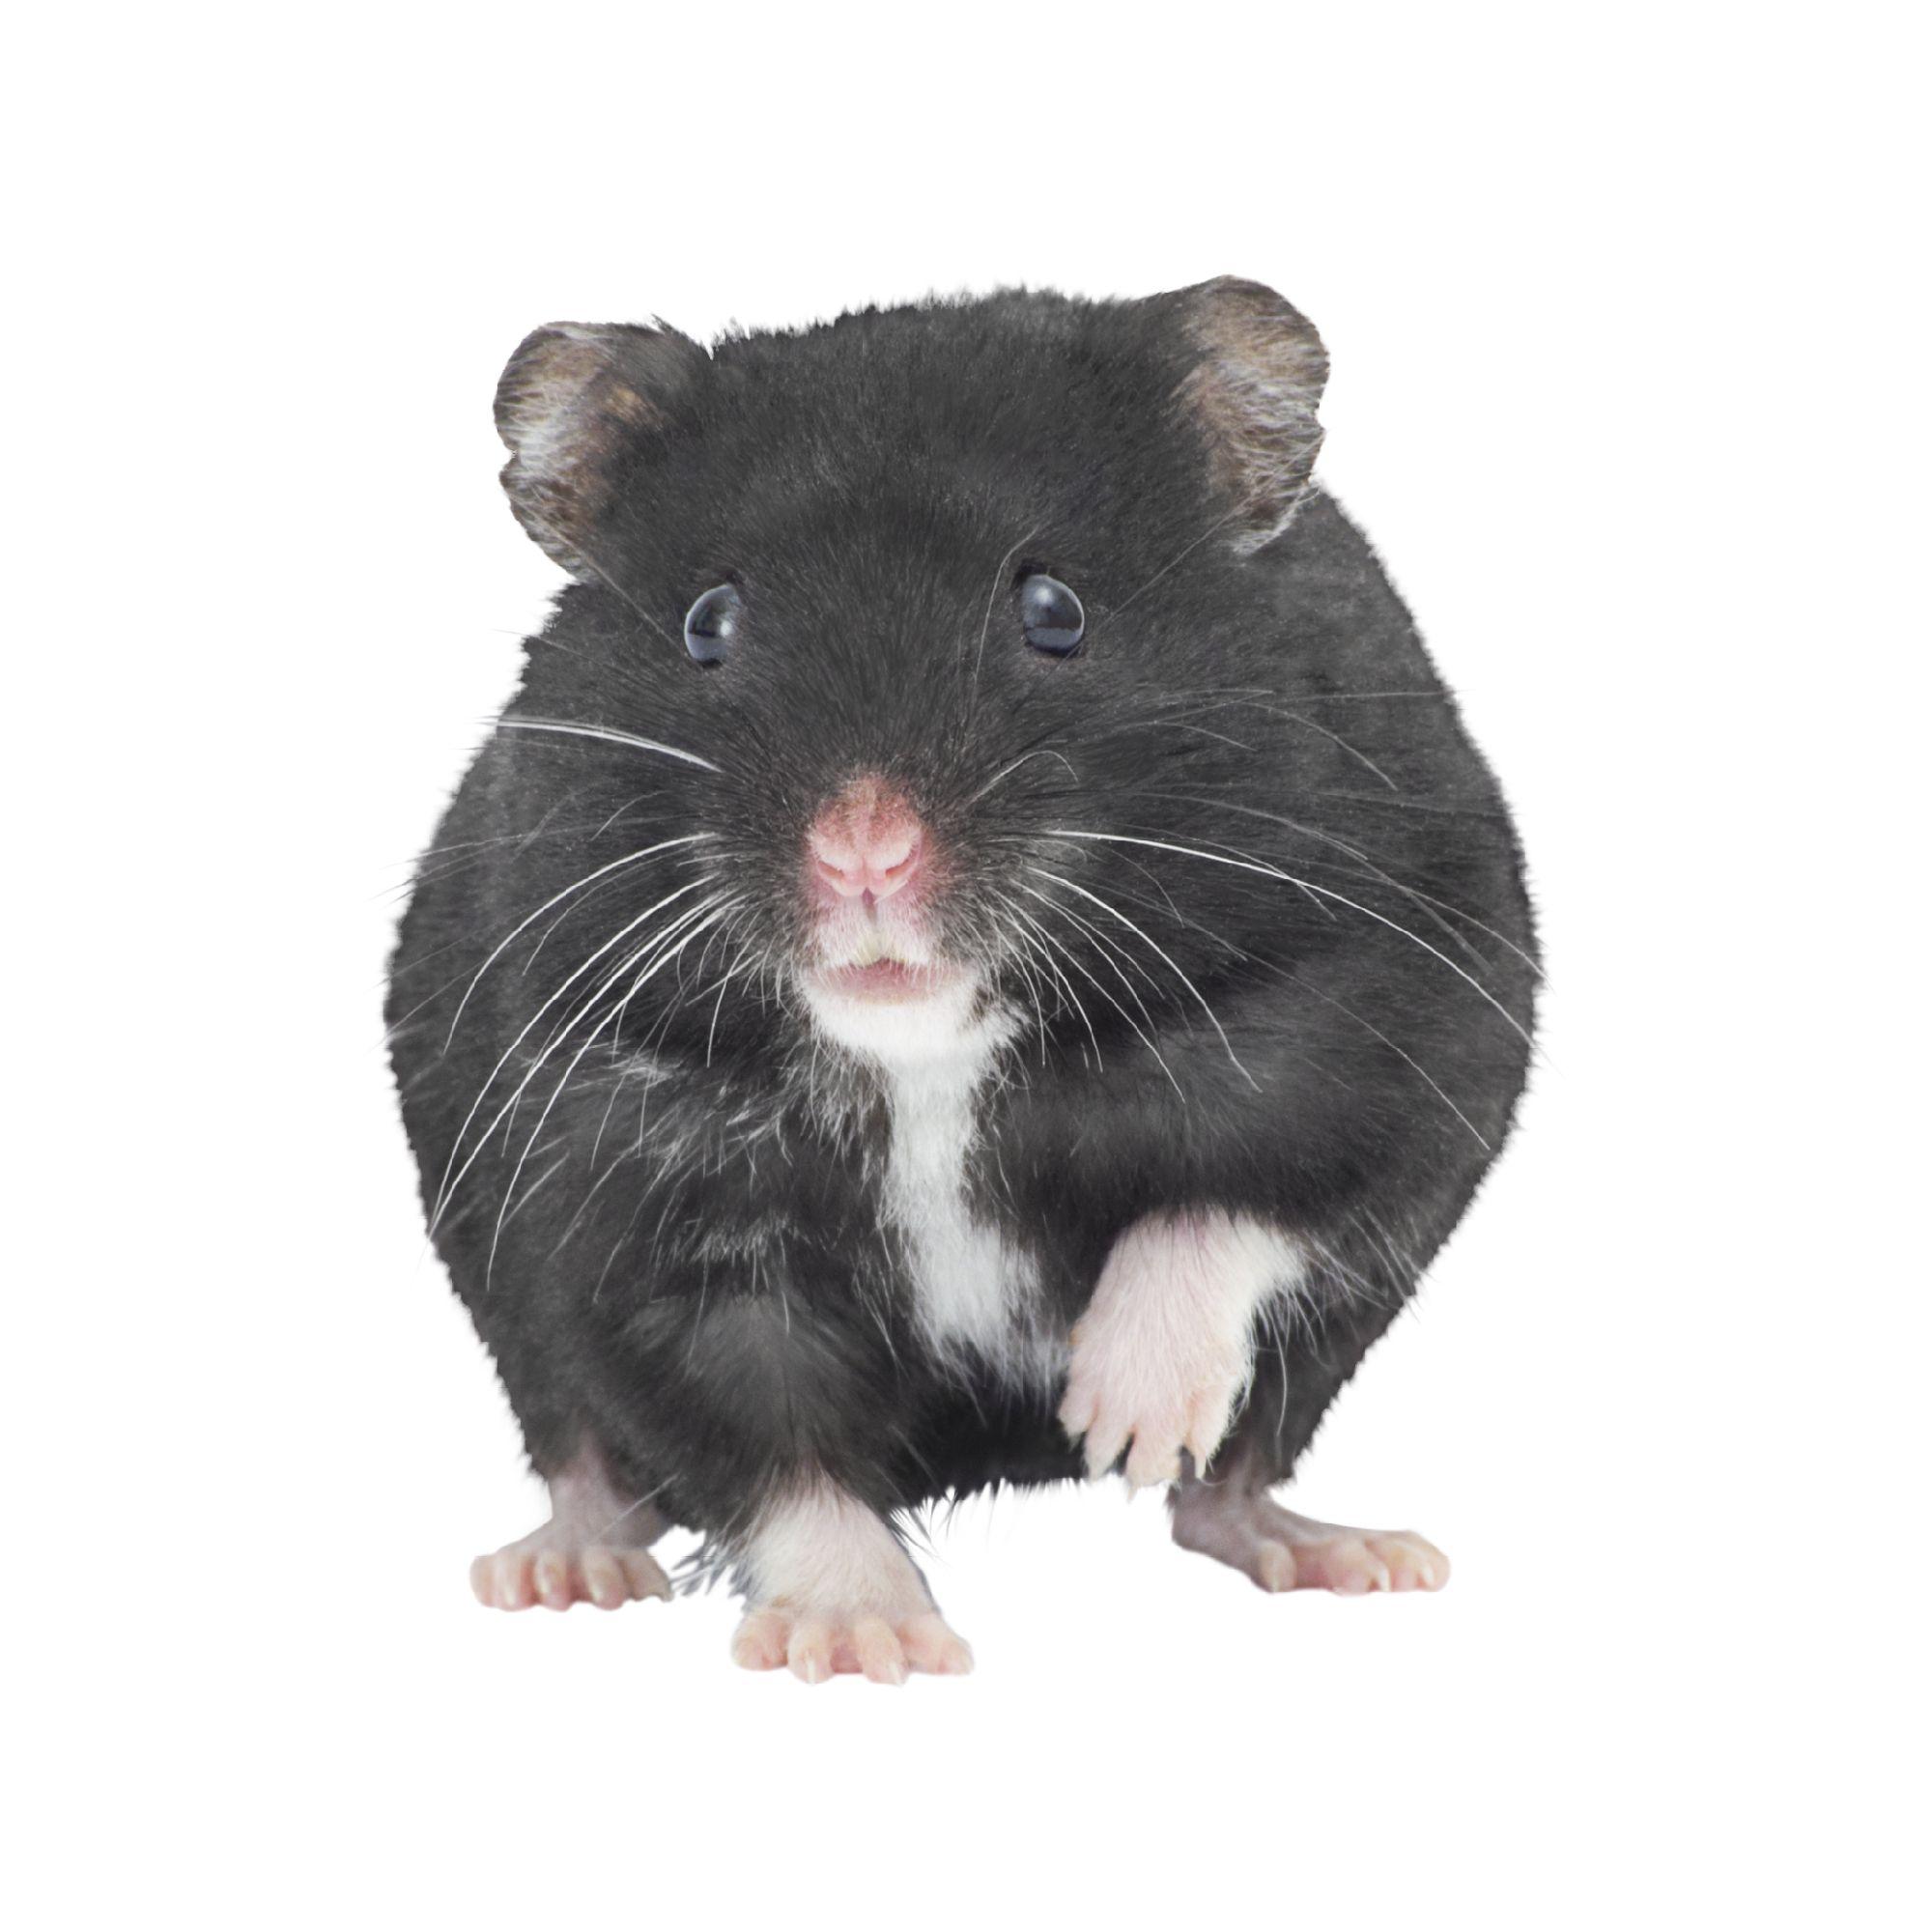 Russian Dwarf Hamster Small Pet Hamsters Guinea Pigs More Petsmart